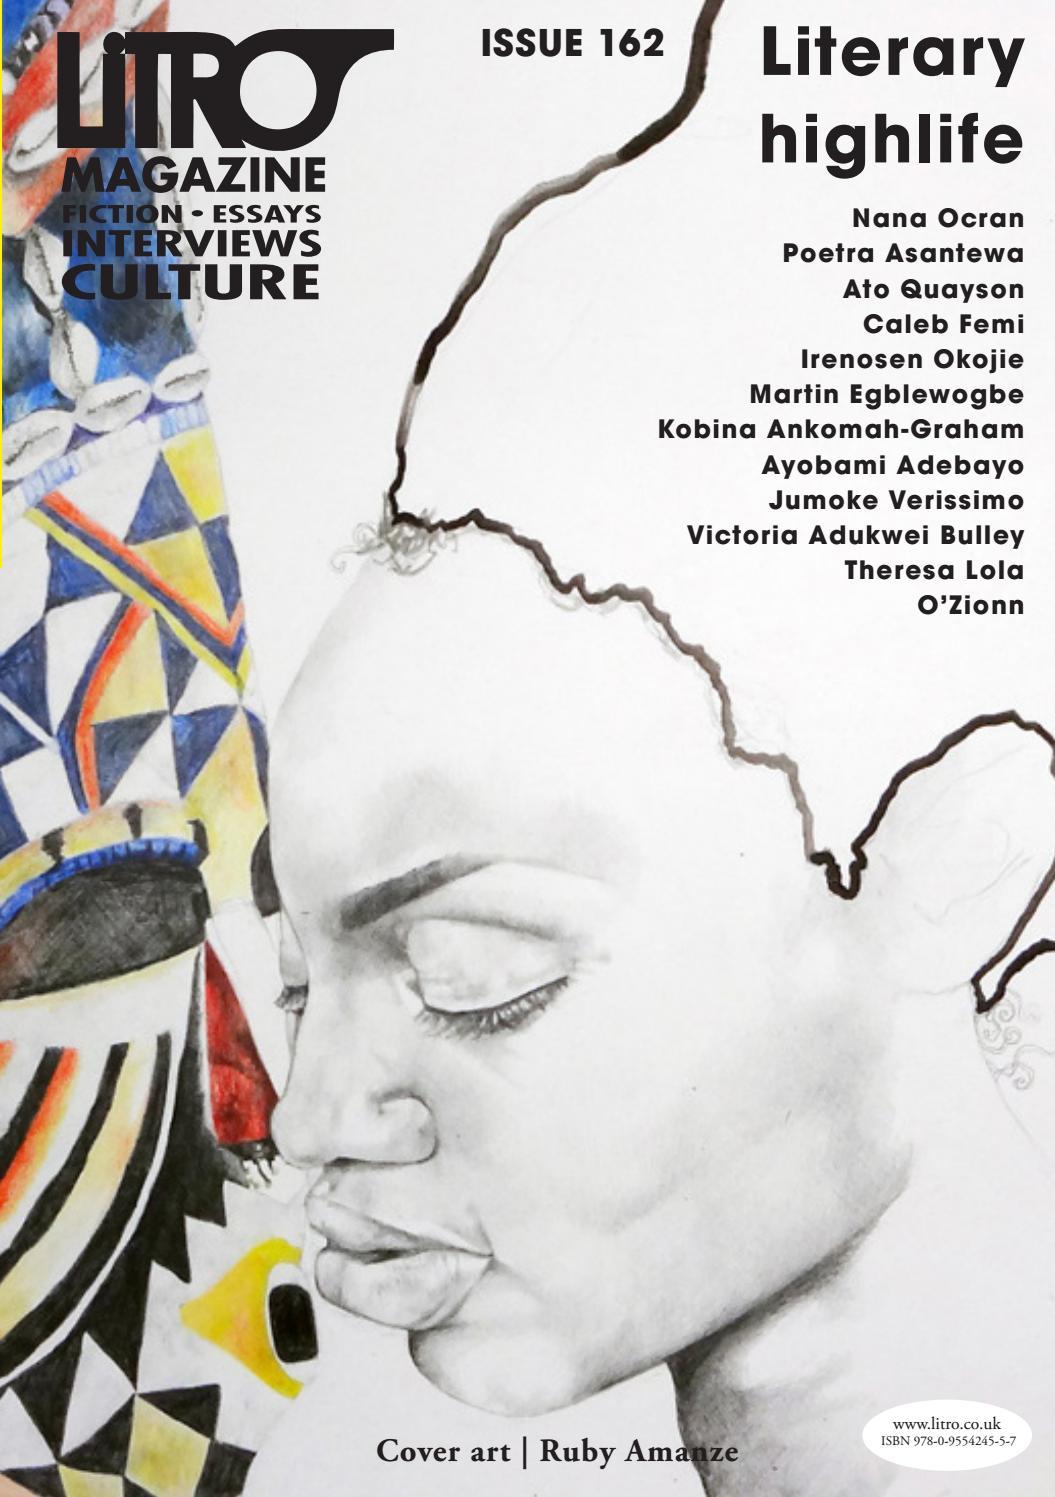 essays and fiction magazine